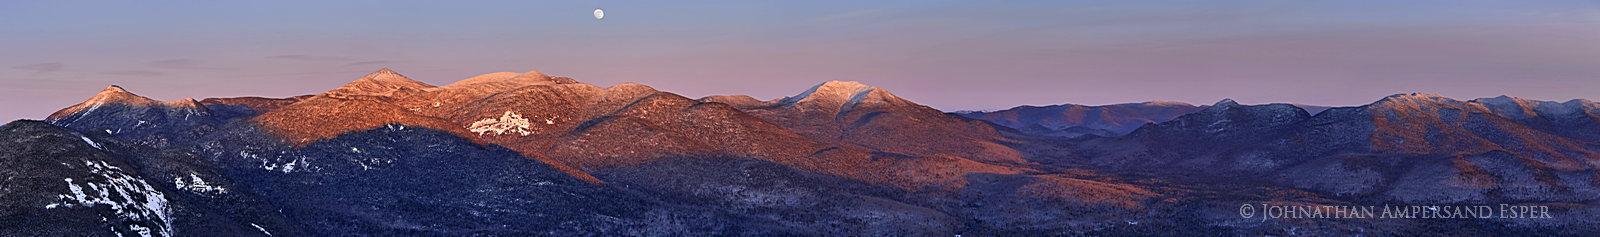 Mt Adams,Mt Adams firetower,firetower,Adirondack High Peaks,Adirondack Mountains,alpenglow,moon,winter, photo